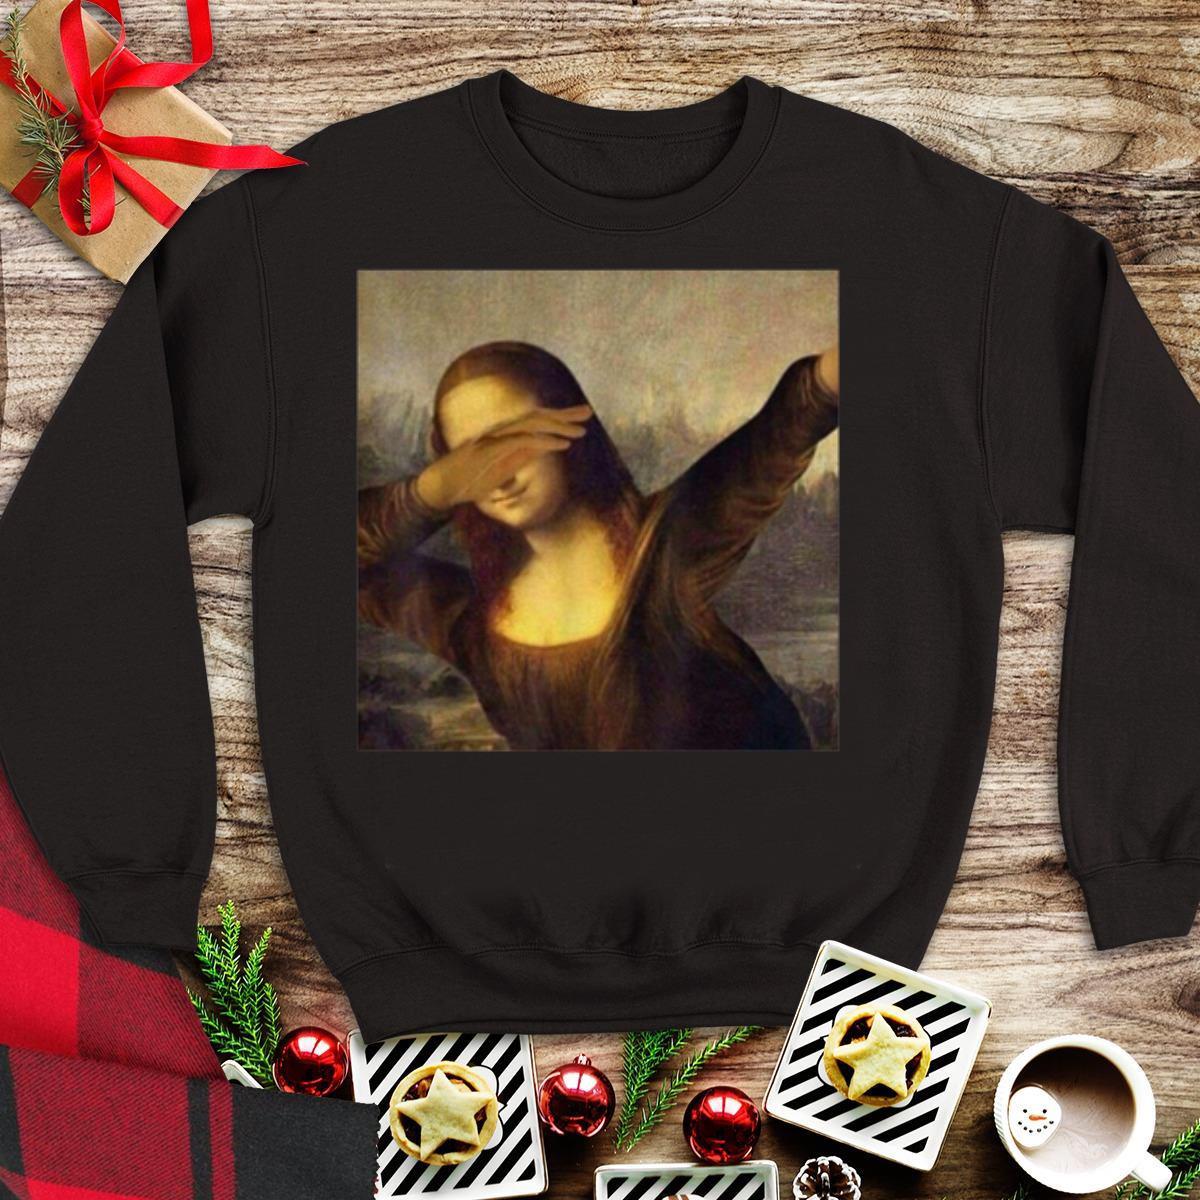 Awesome Dabbing Mona Lisa La Gioconda Chrissy Insta shirt